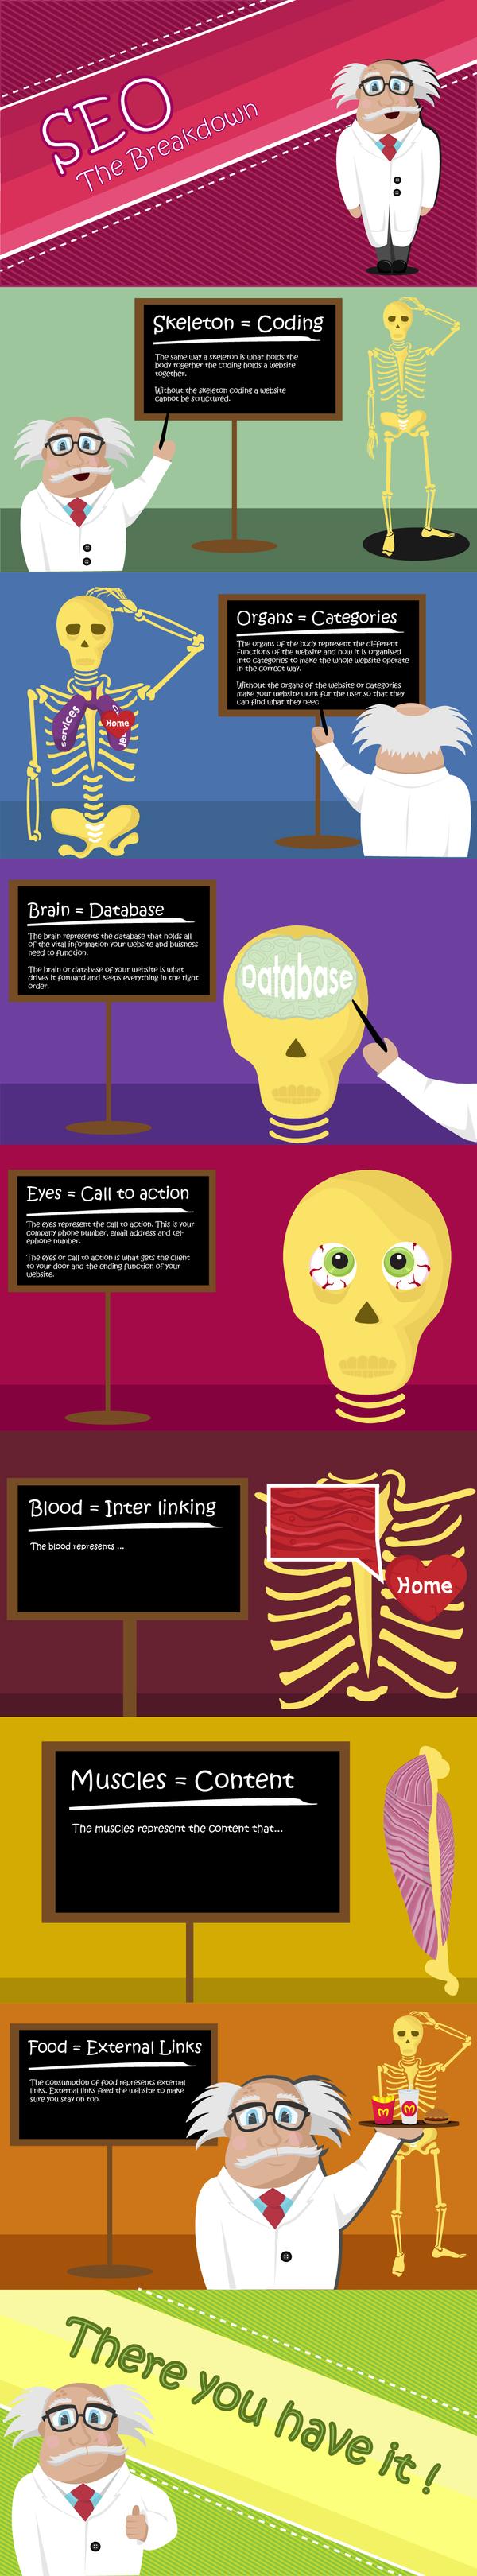 web-design-graphic-design-infographics-006